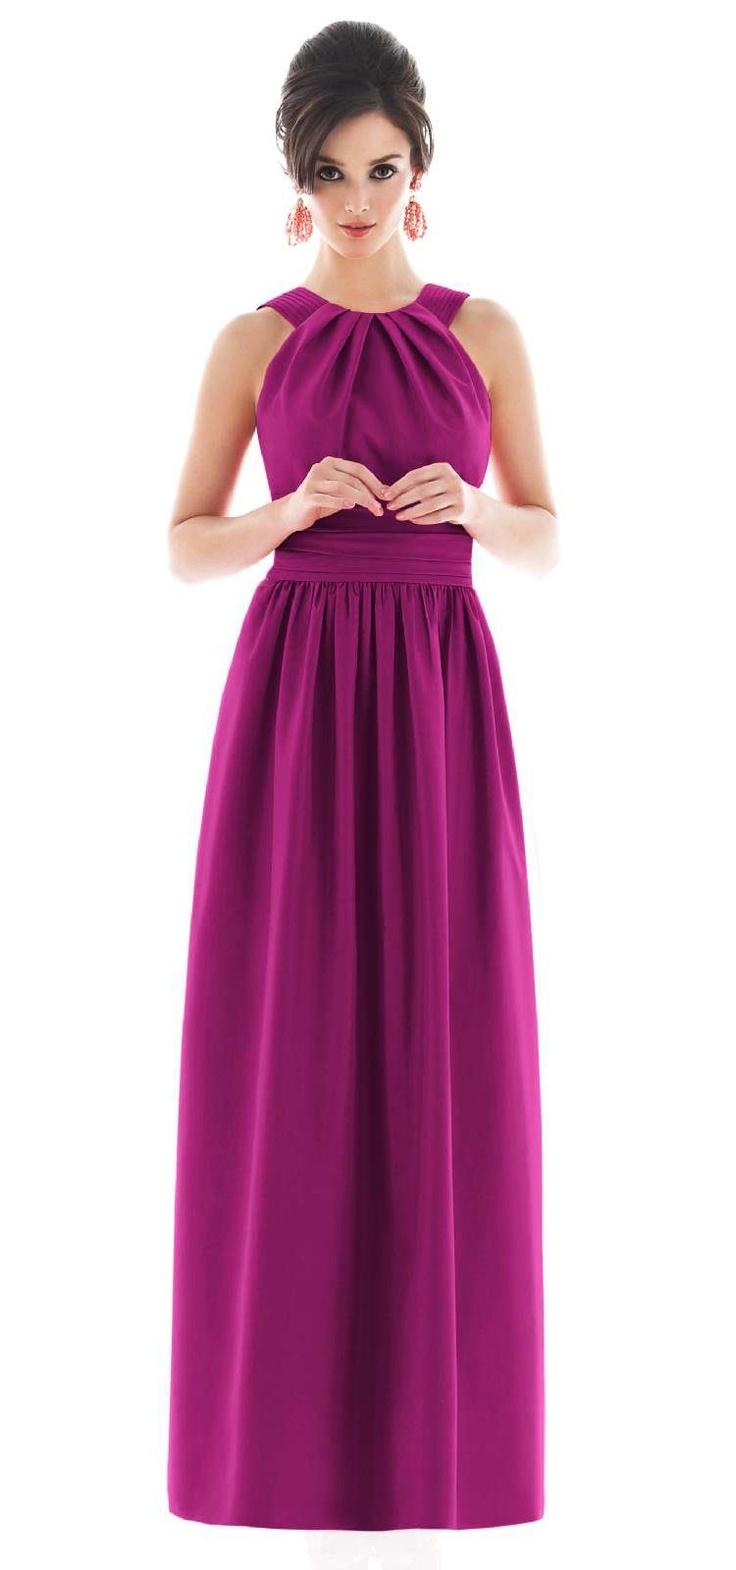 Alfred Sung Floor Length Magenta Bridesmaid Dress, STYLE D493, 625 Watermelon, via Weddington Way